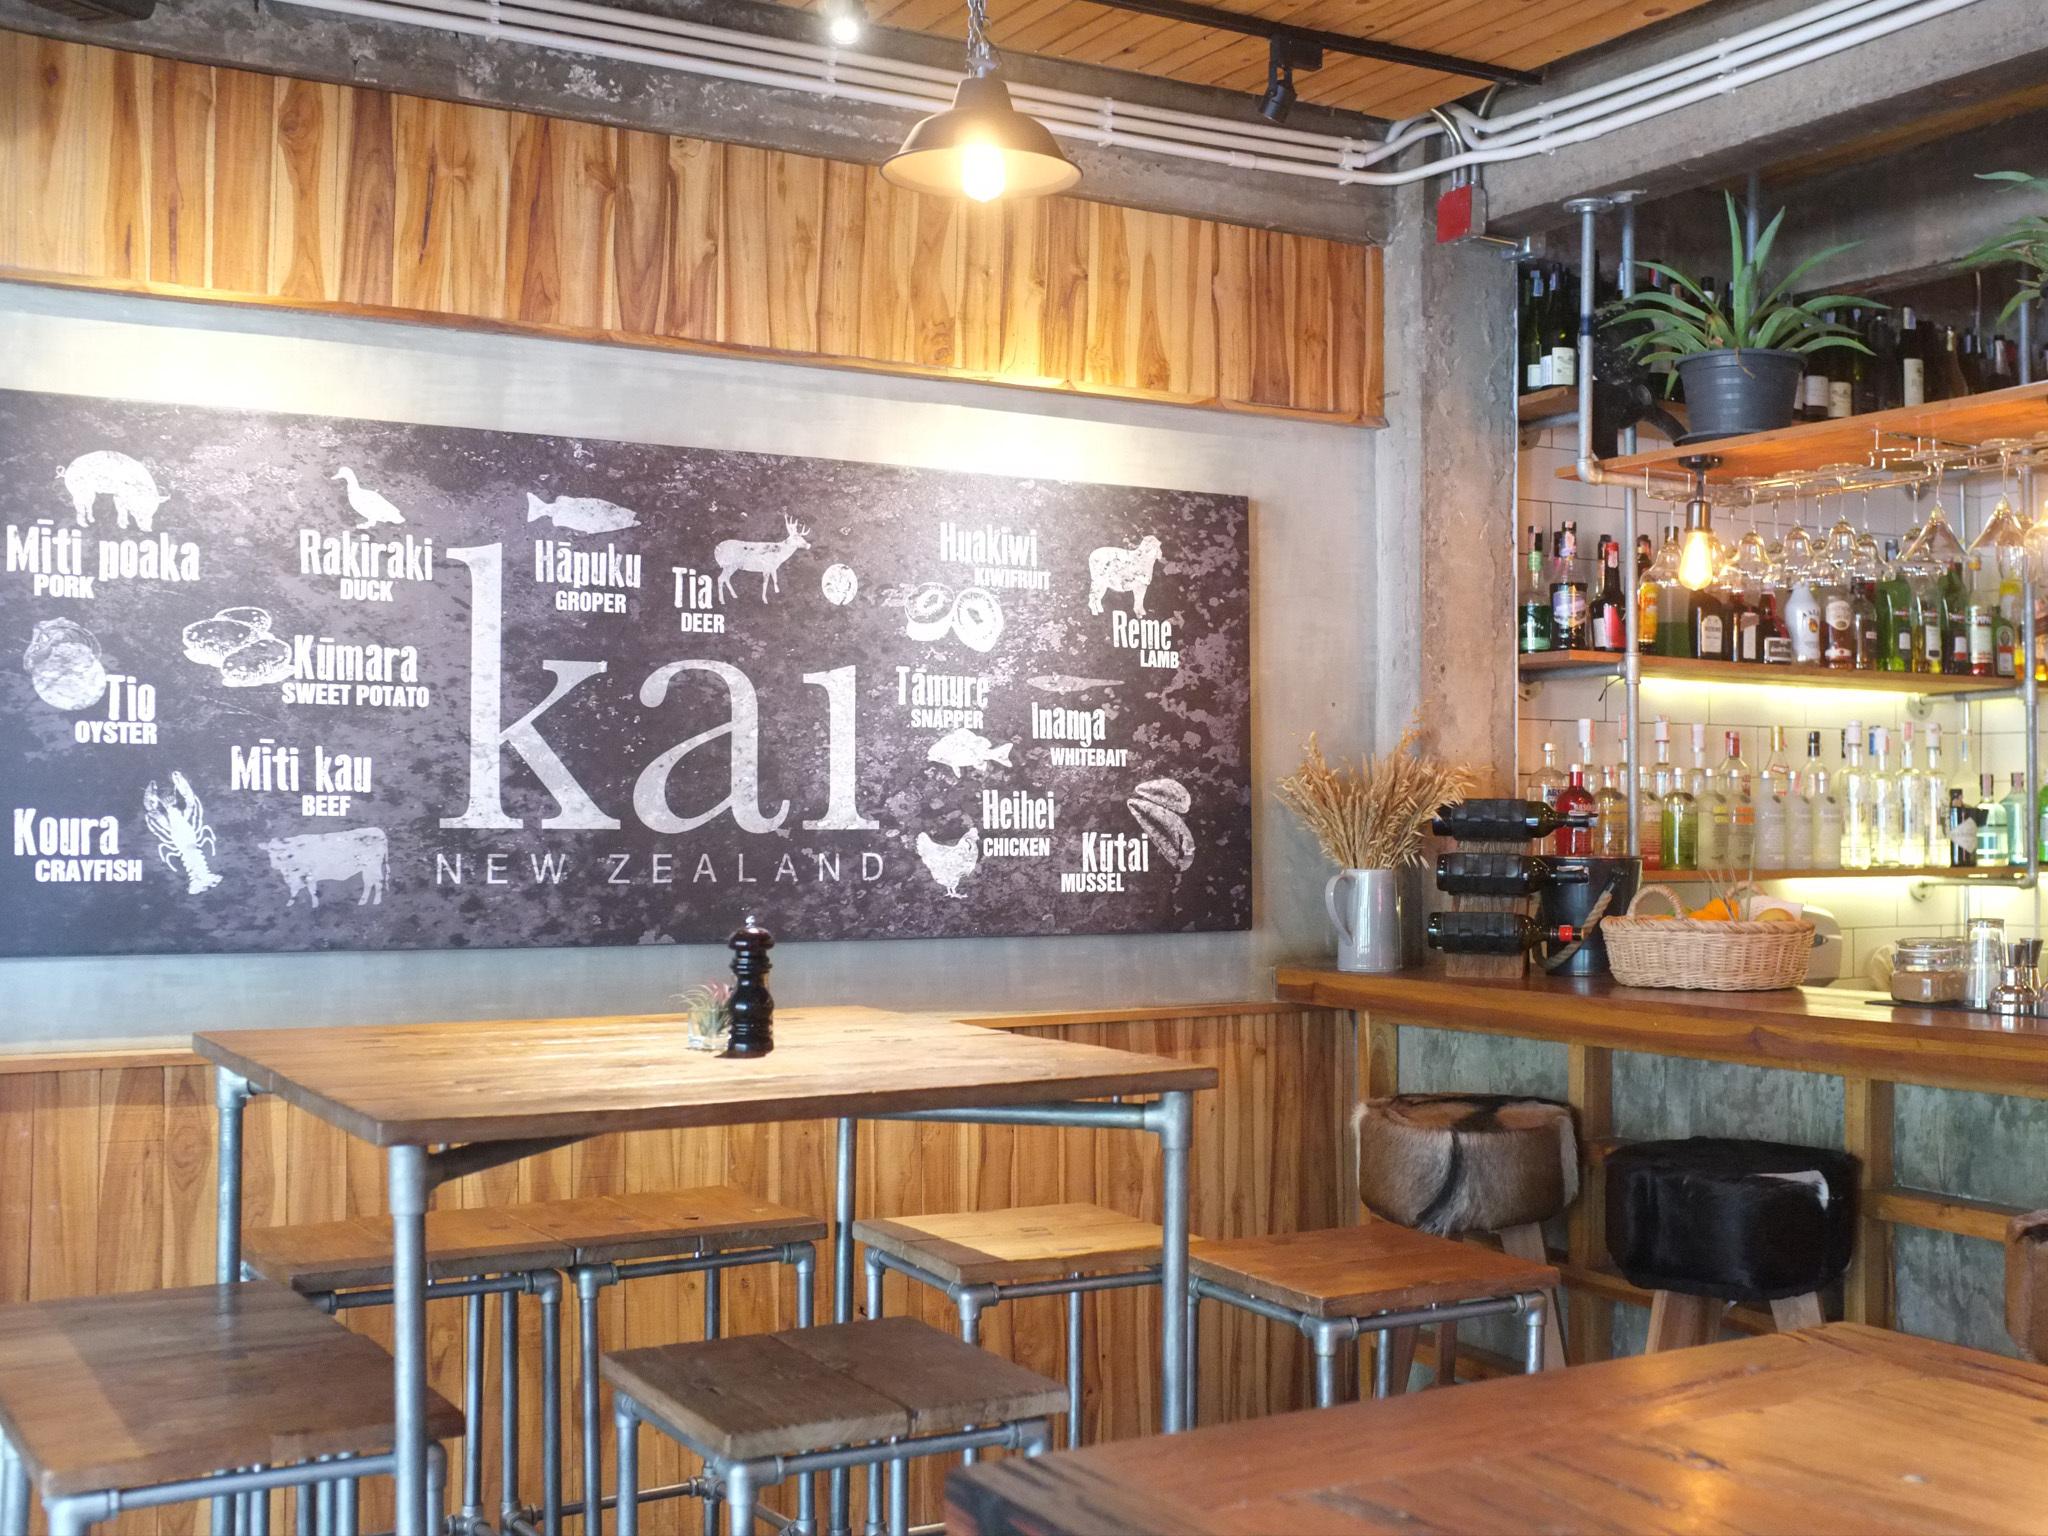 Kai New Zealand